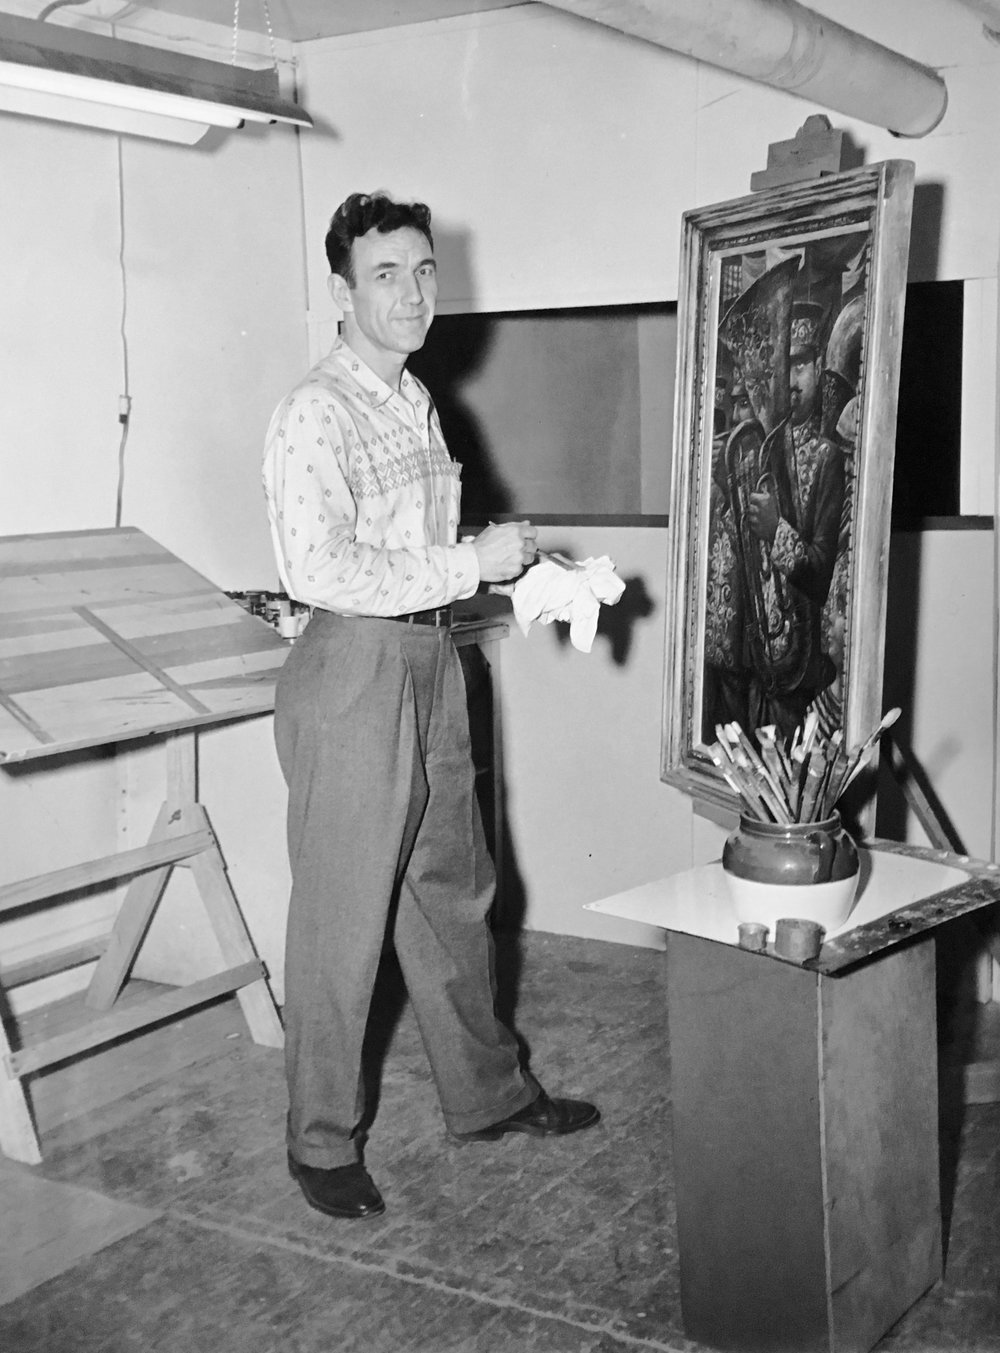 Robert Edward Weaver c. 1952